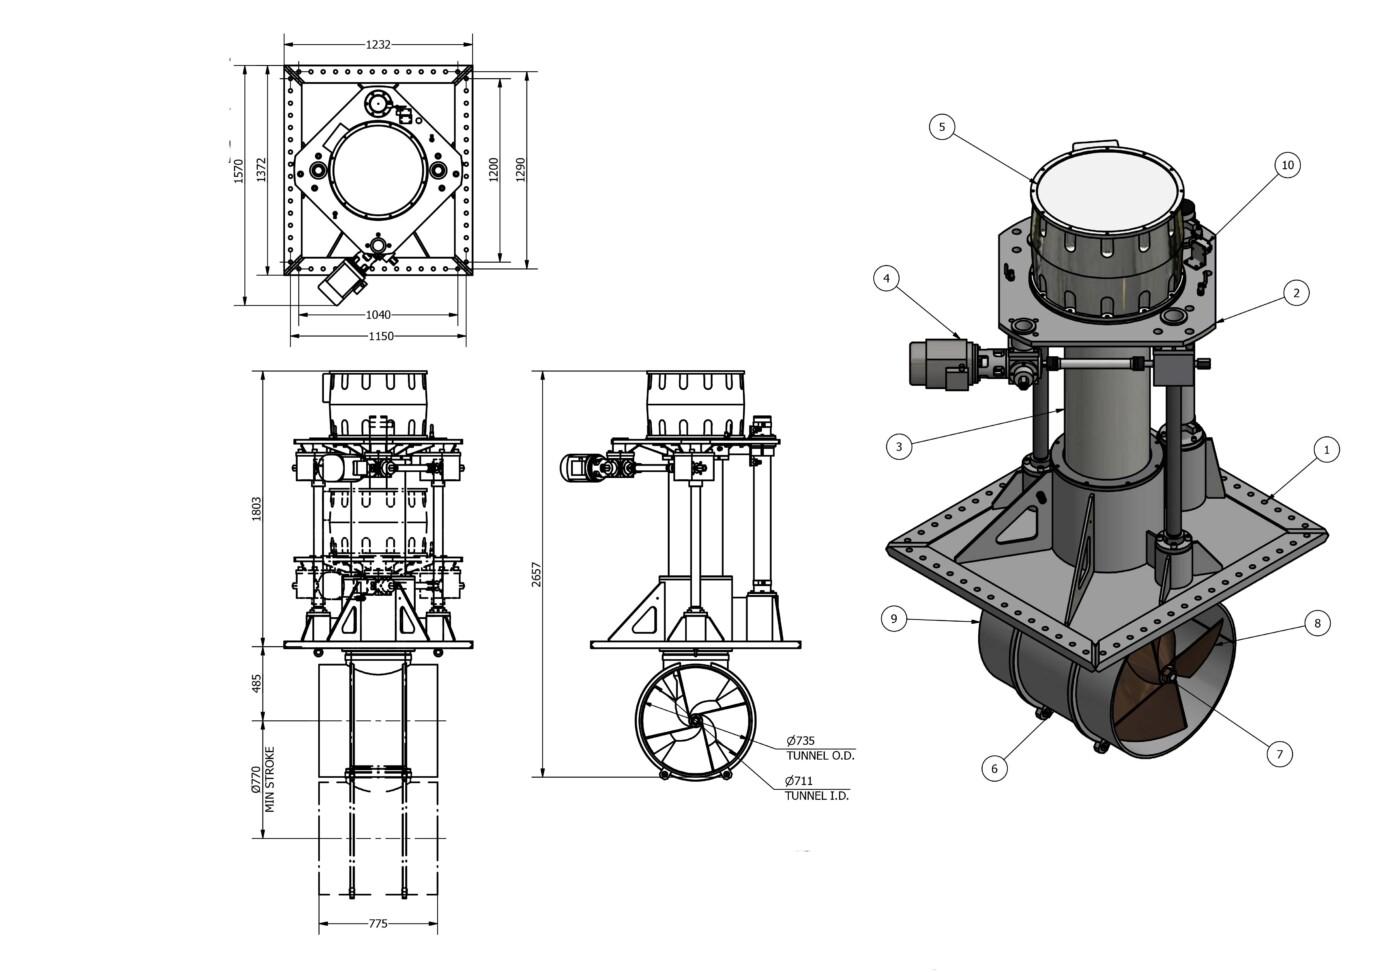 OMS Electrical Vertical Thruster E-0700-V